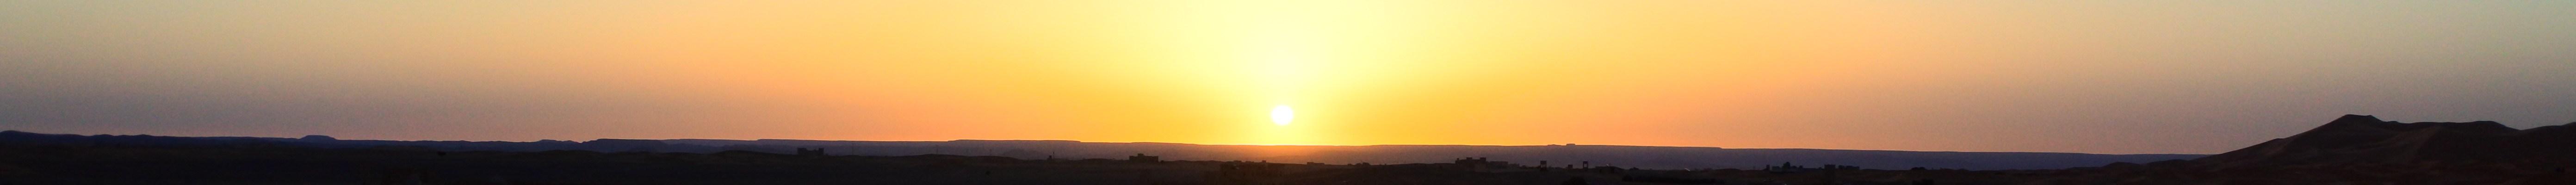 Zonsopgang woestijn marokko